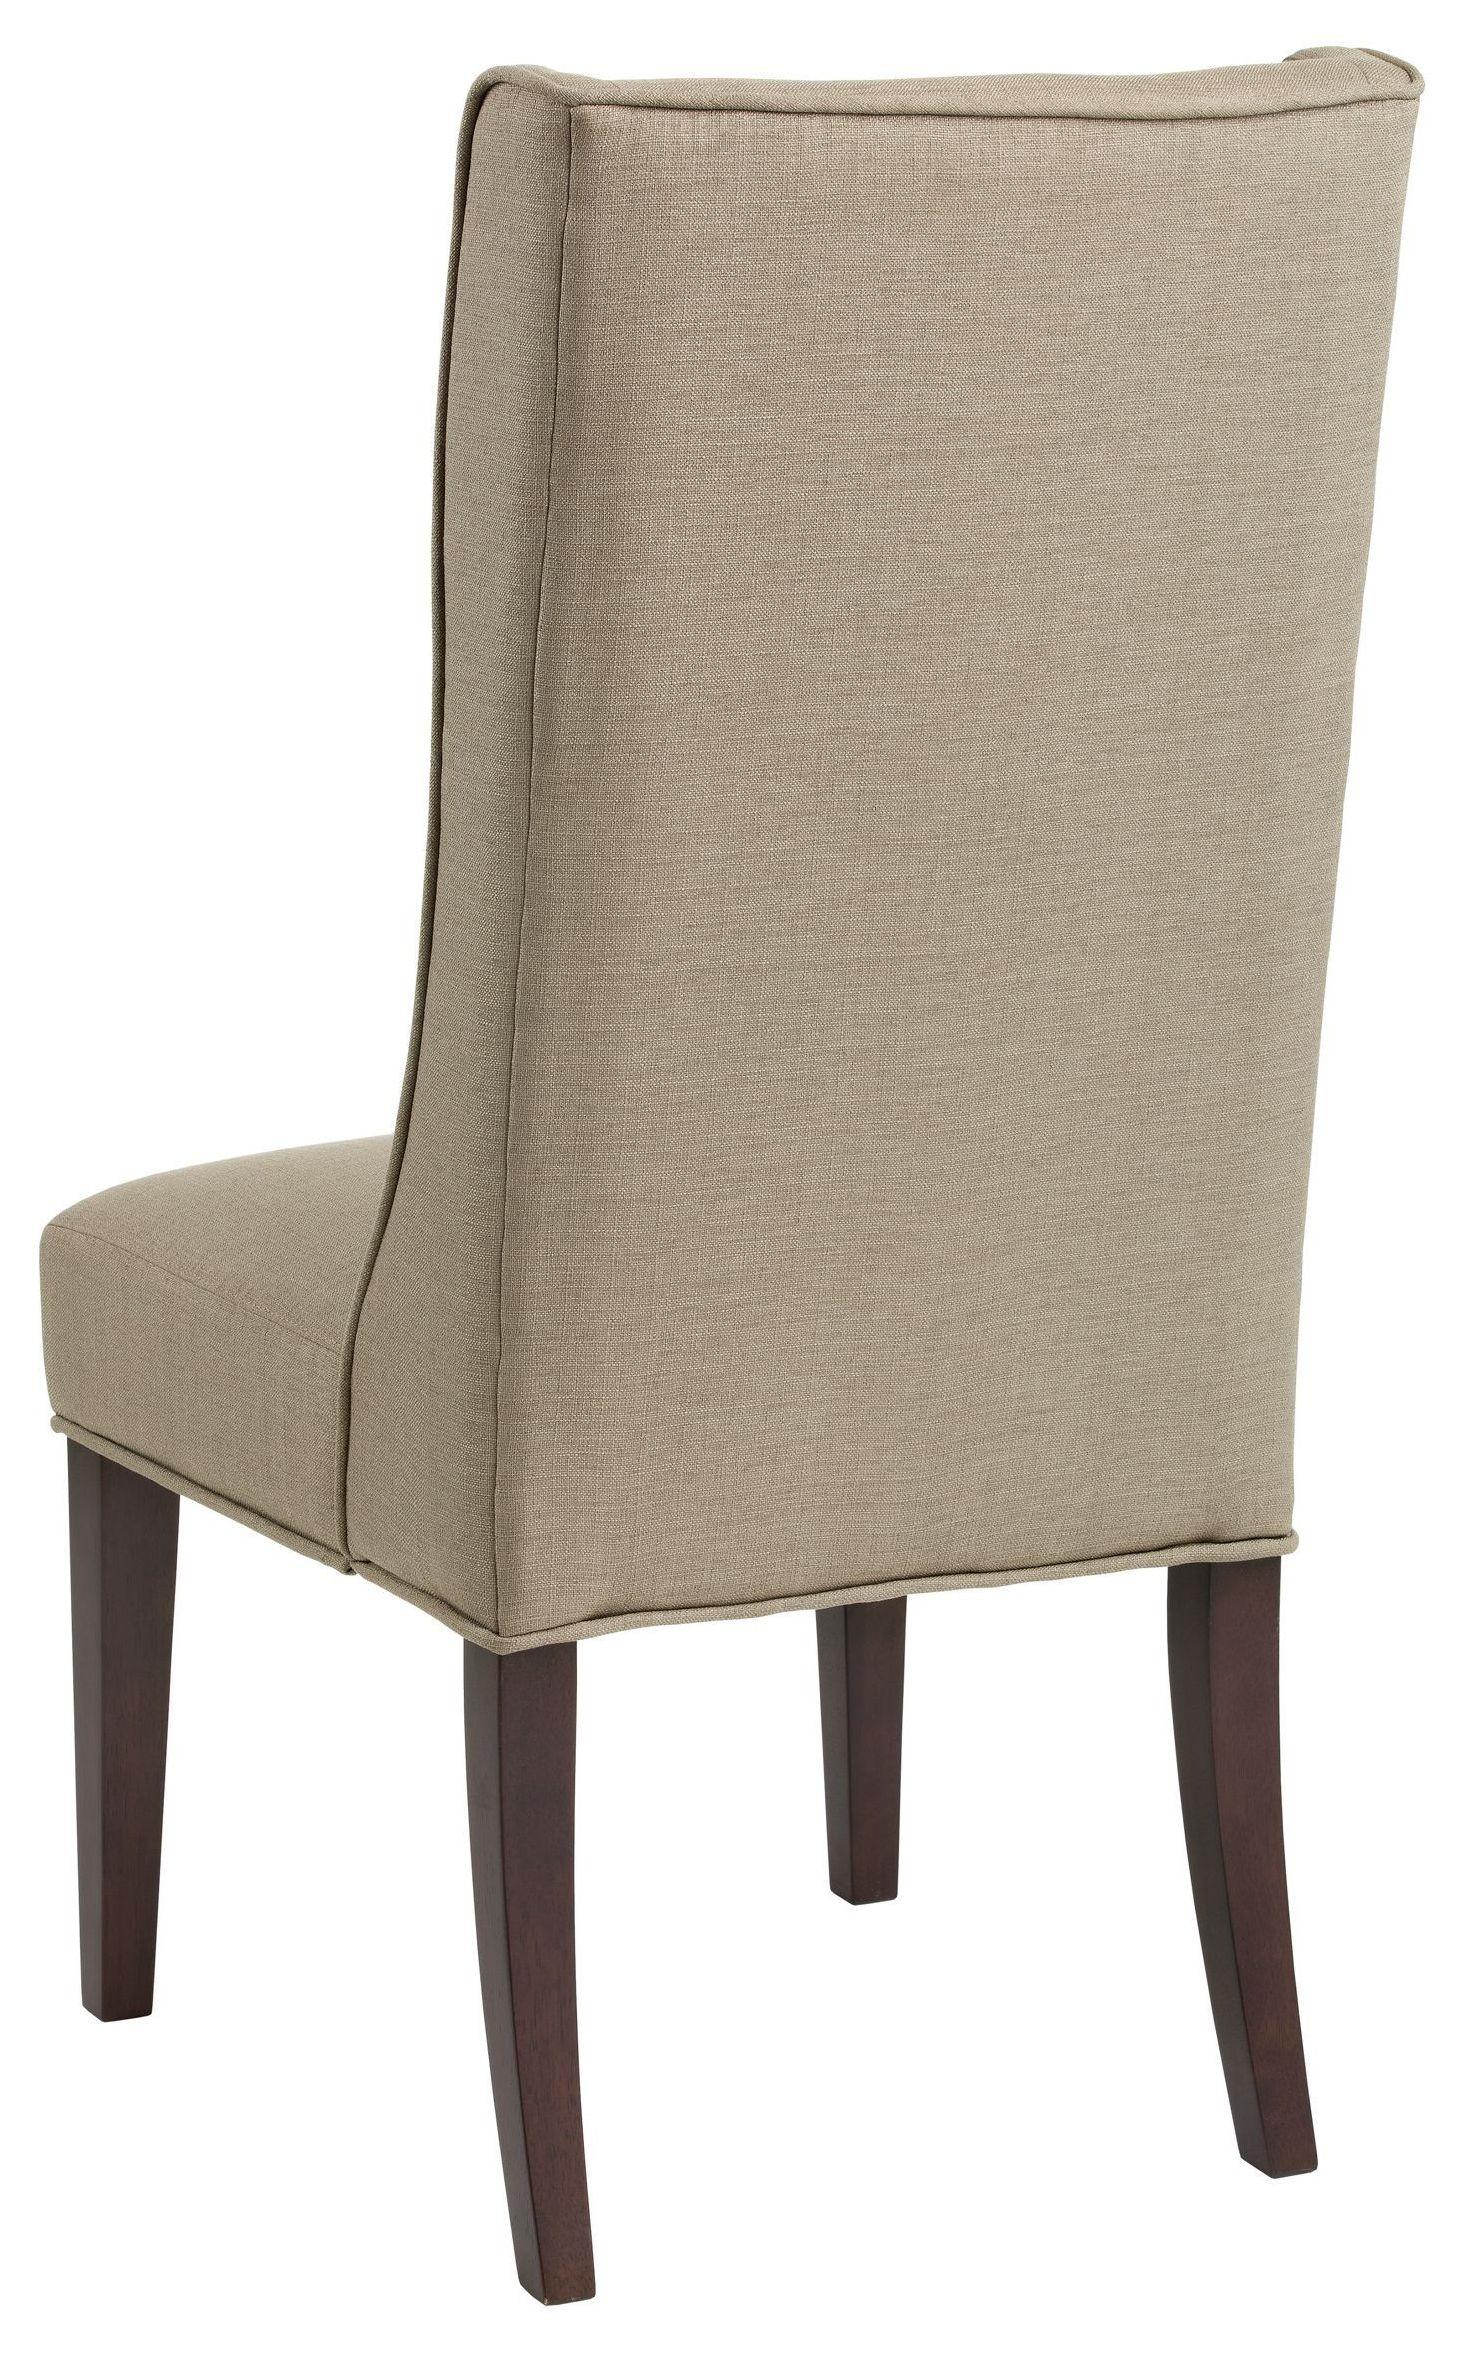 100461 Sabine Linen Dining Chair Set Of 2 From Sunpan